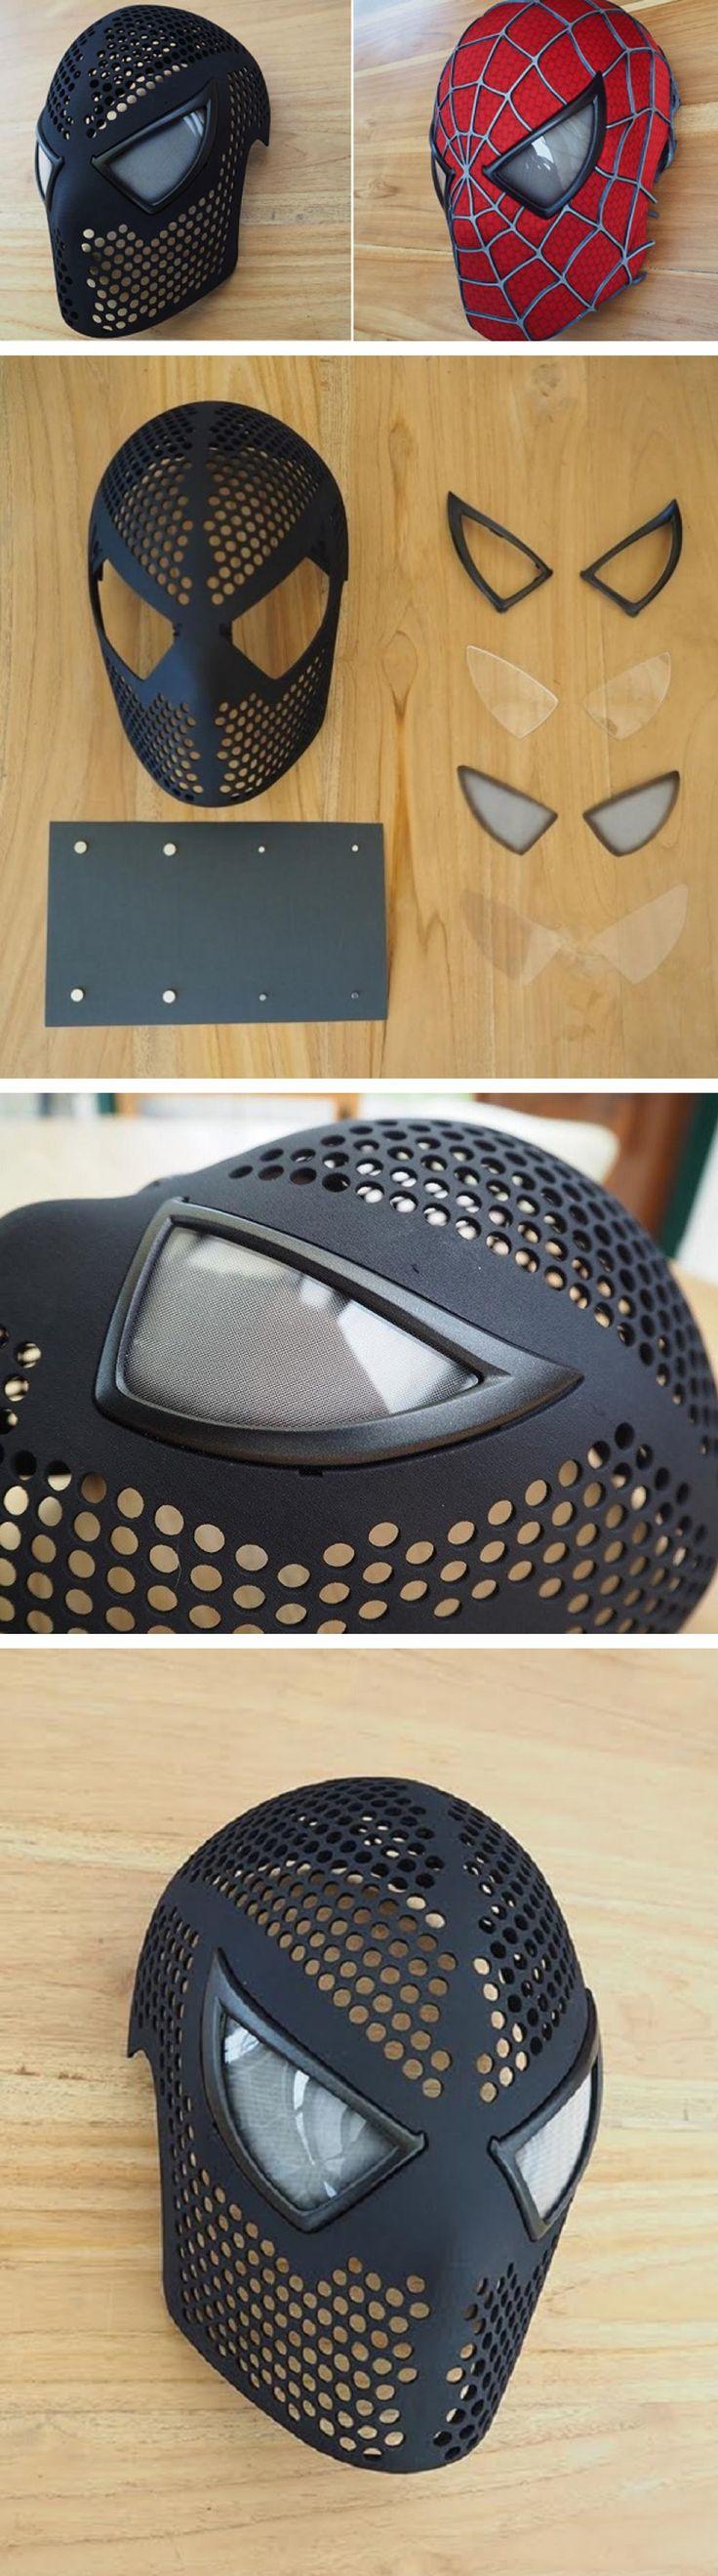 Costume designer Yuri Schuurkes designed a 3D printed Spider-man mask you can buy! (Diy Halloween Mask)